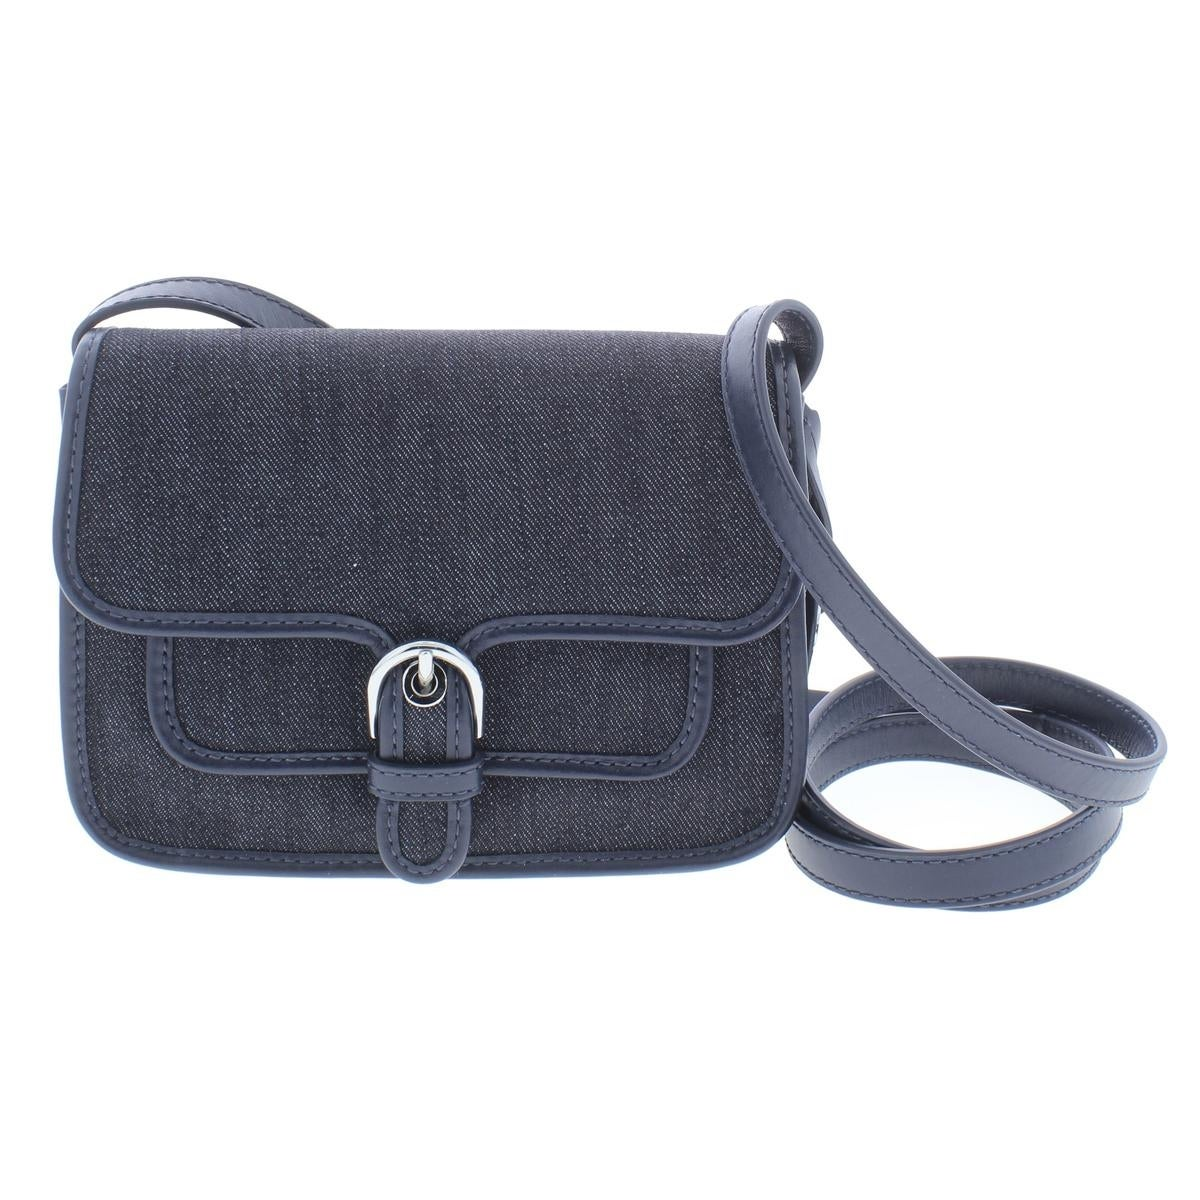 c447369ab7d3 MICHAEL Michael Kors Womens Cooper Crossbody Handbag Denim Everyday - small